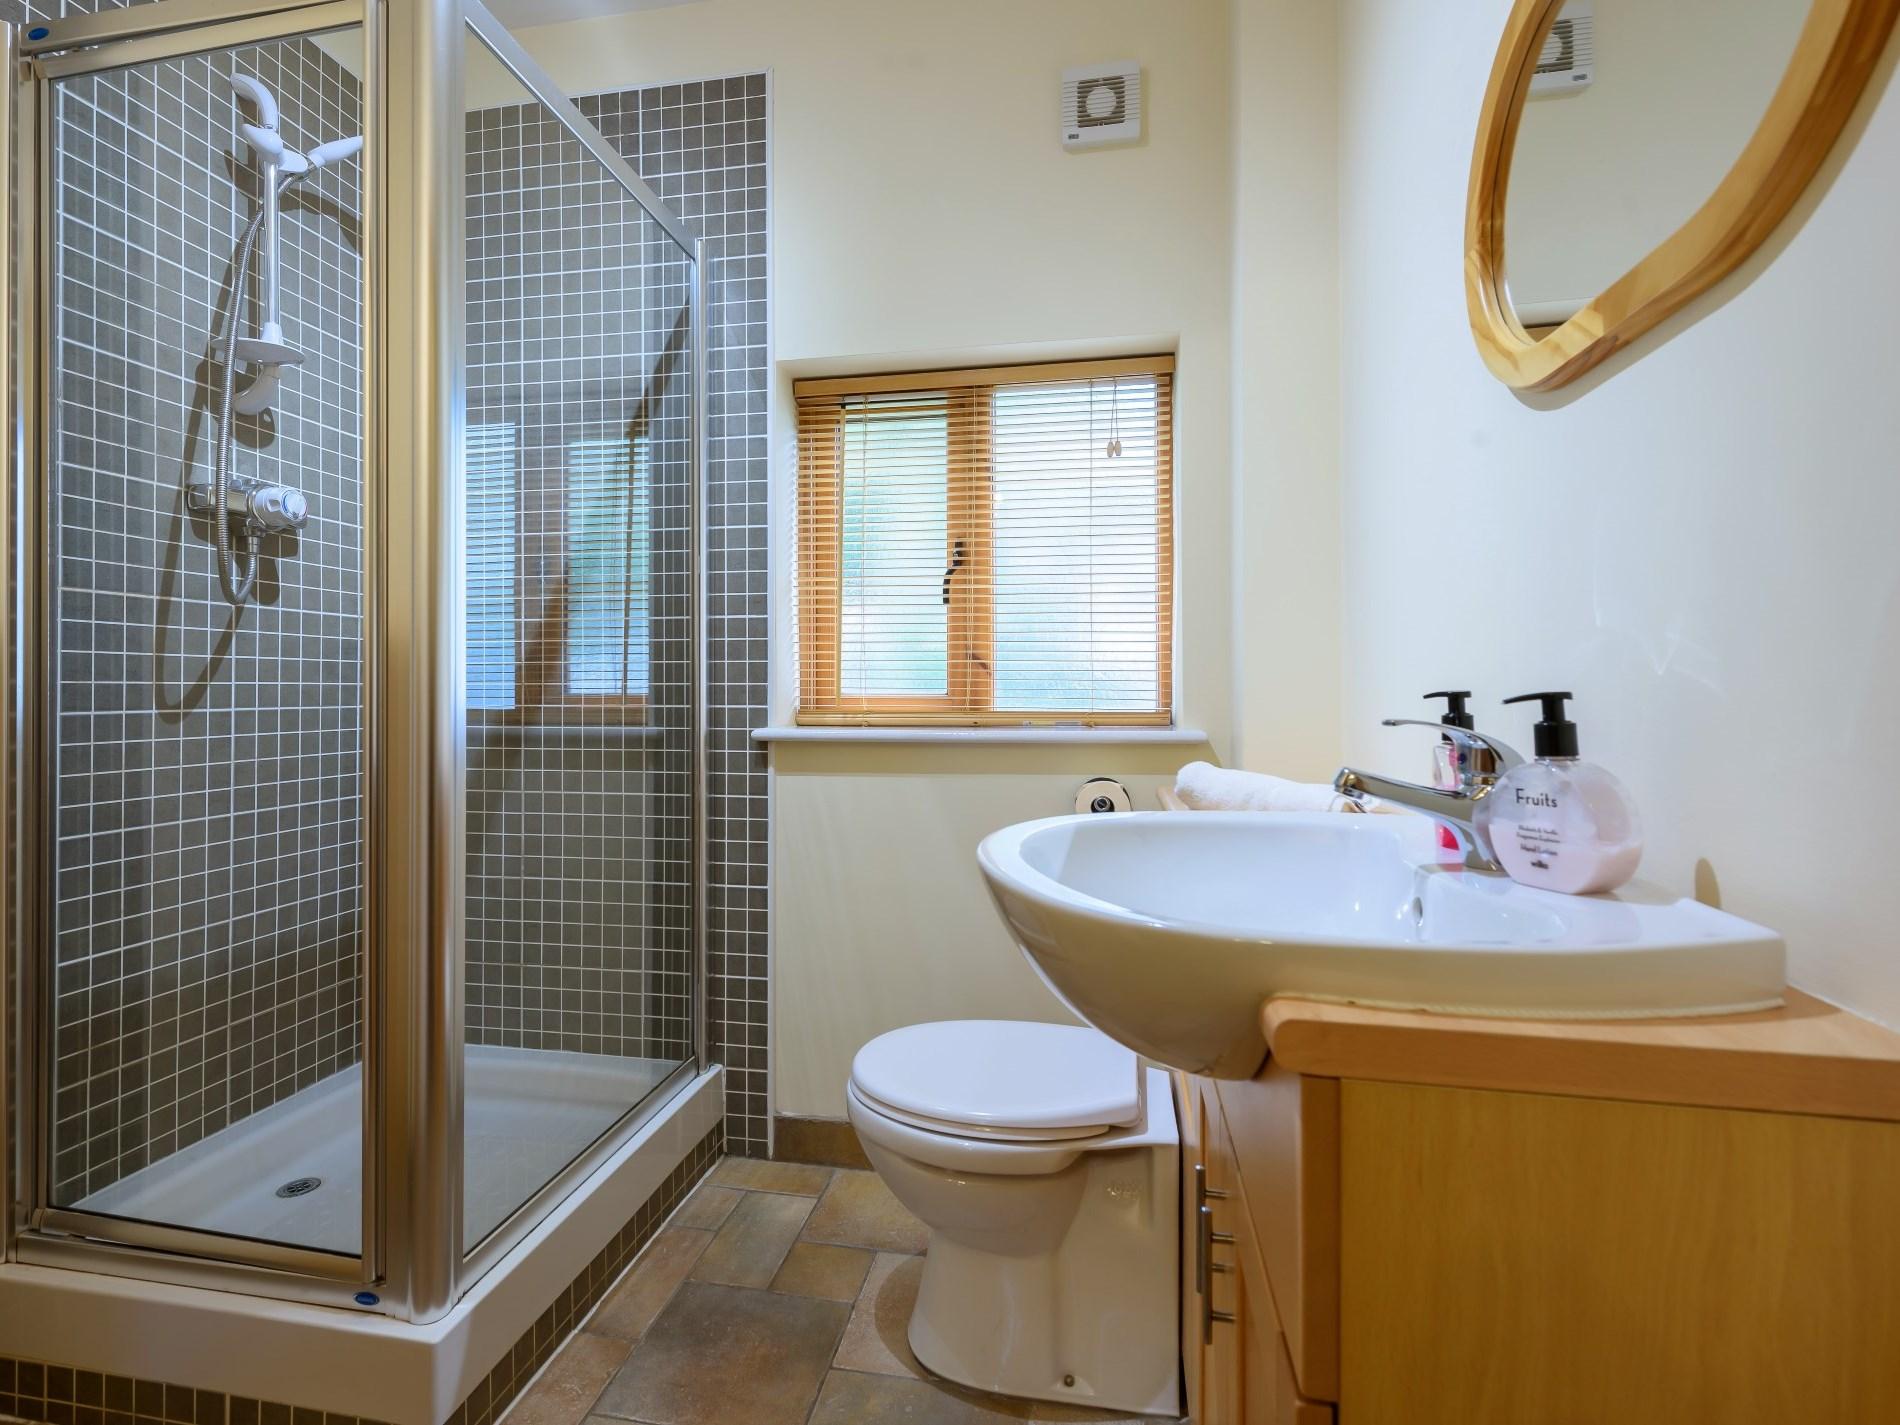 3 Bedroom Cottage in Keswick, Scottish Borders